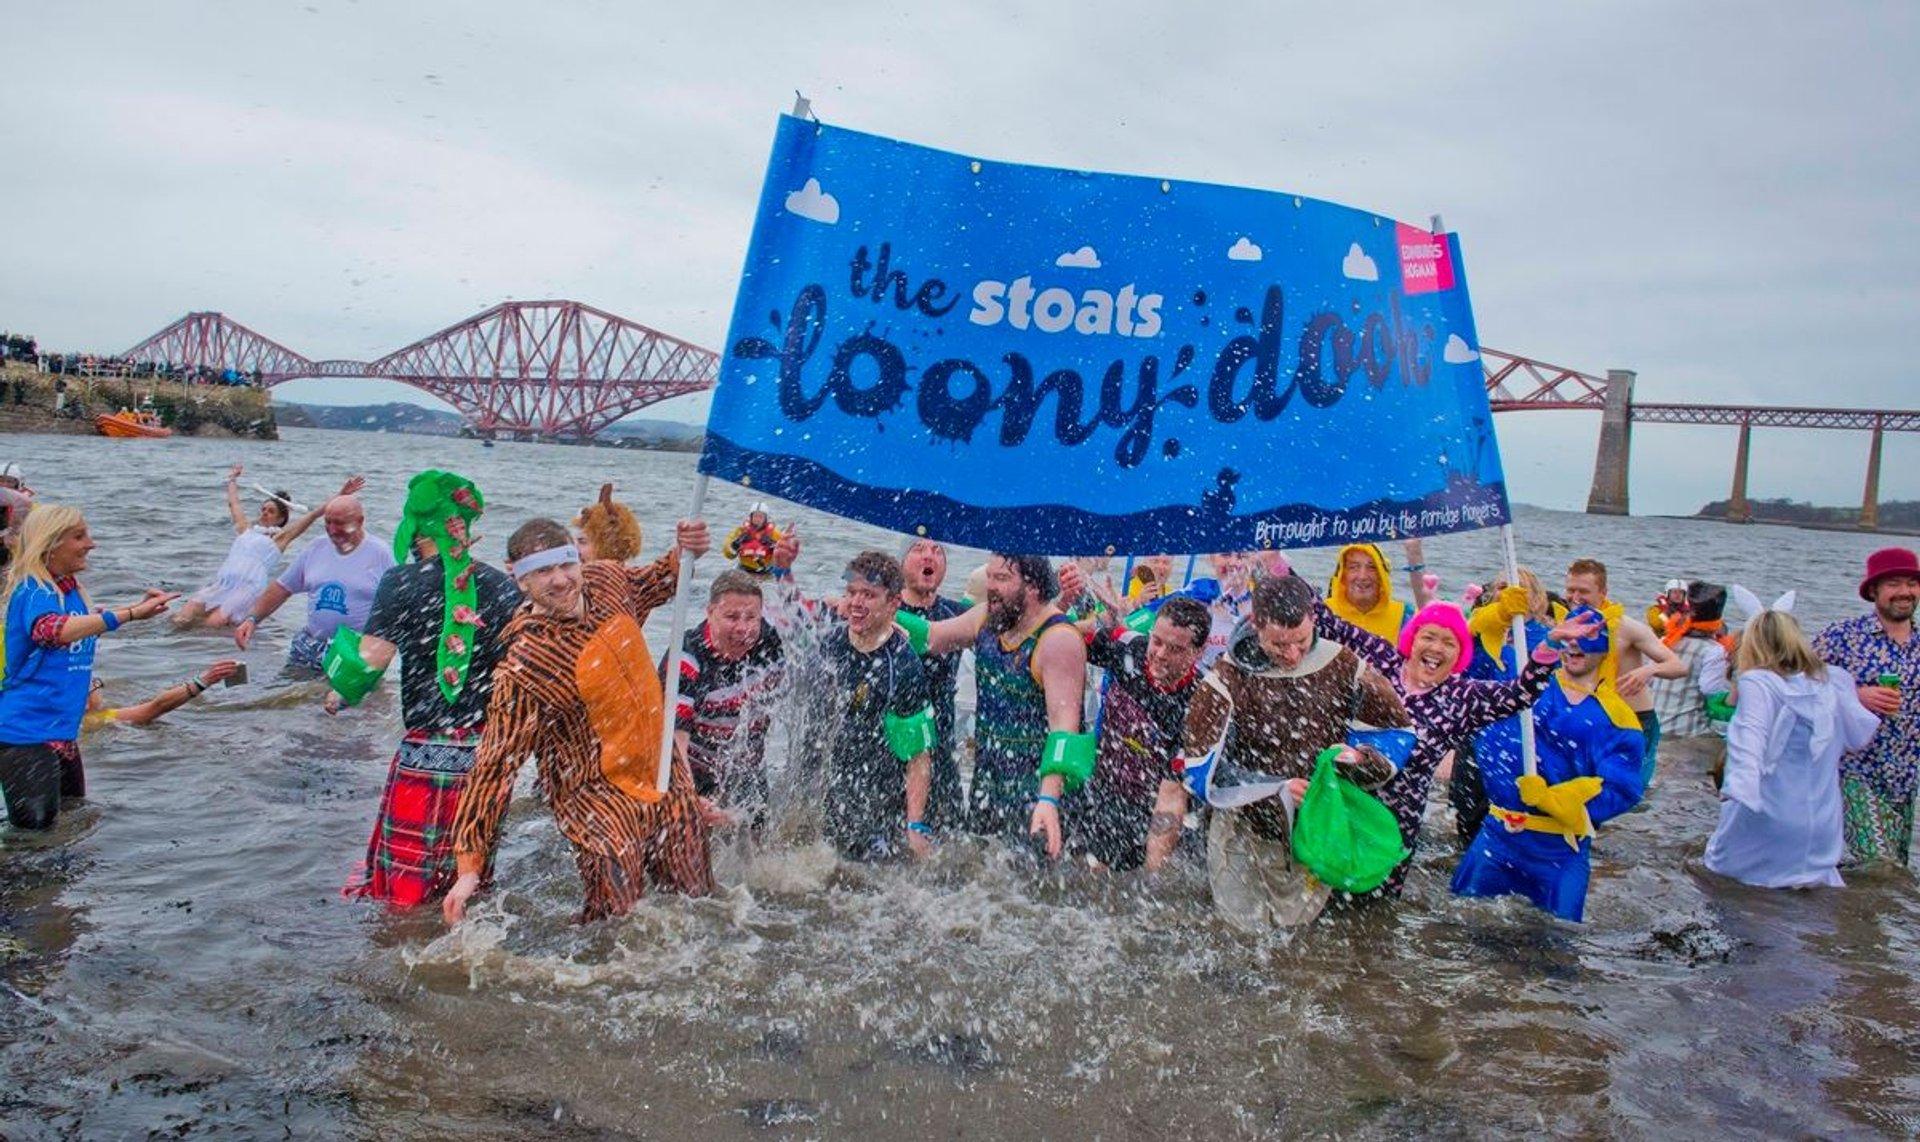 The Loony Dook in Edinburgh 2019 - Best Time